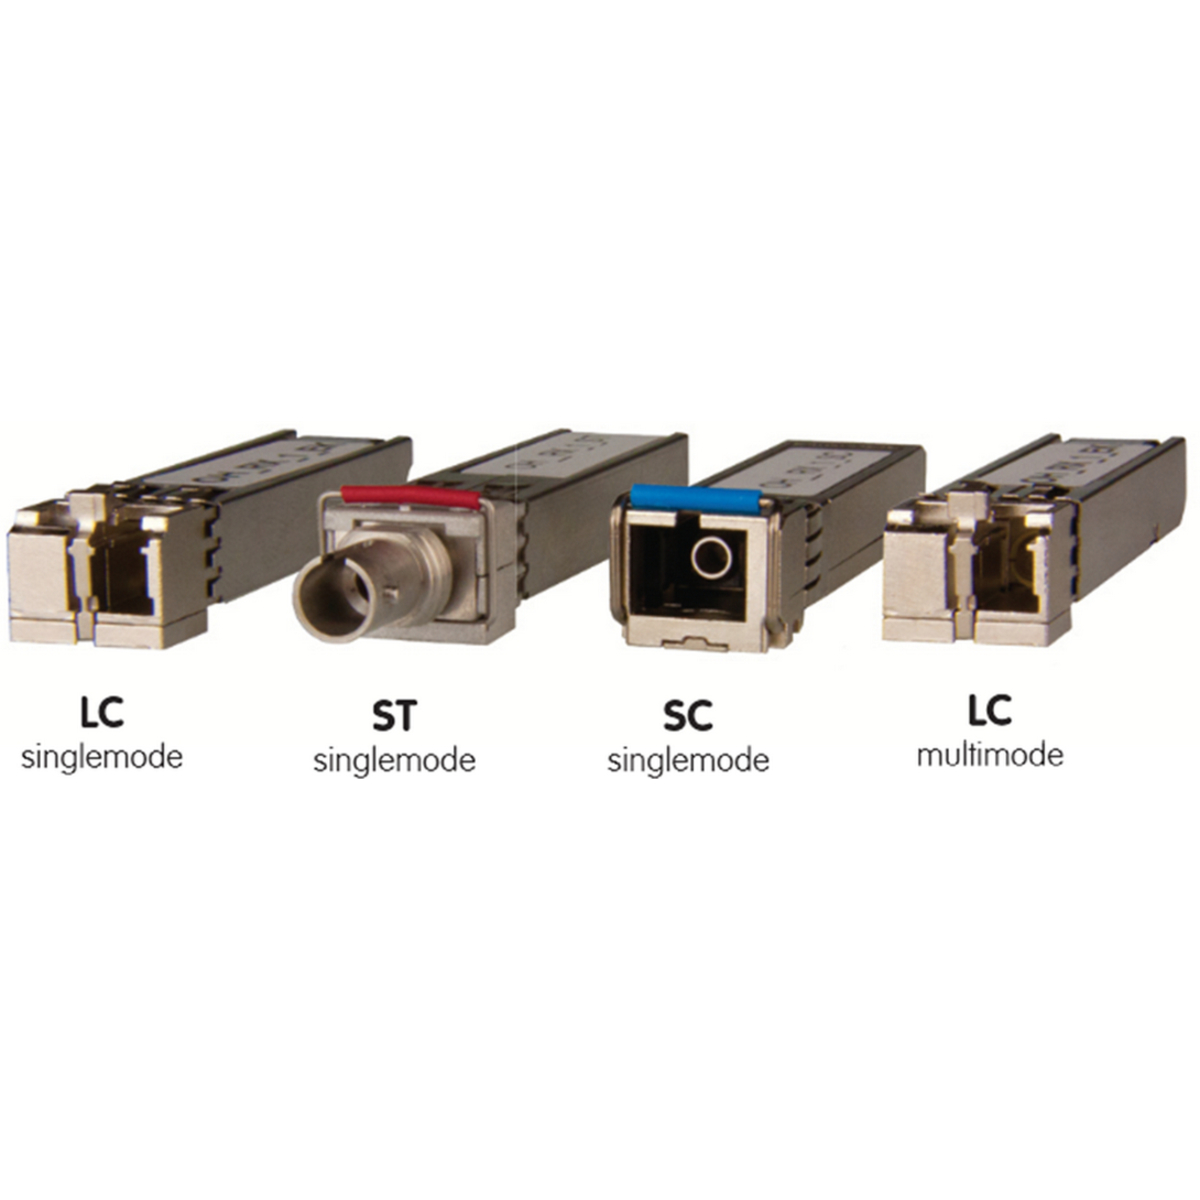 Lynx Technik: OTX-1712-ST (yellobrik) Analogue Sync/Video to Fibre Optic  Transmitter (Singlemode, 1310nm, ST connector, 10km)